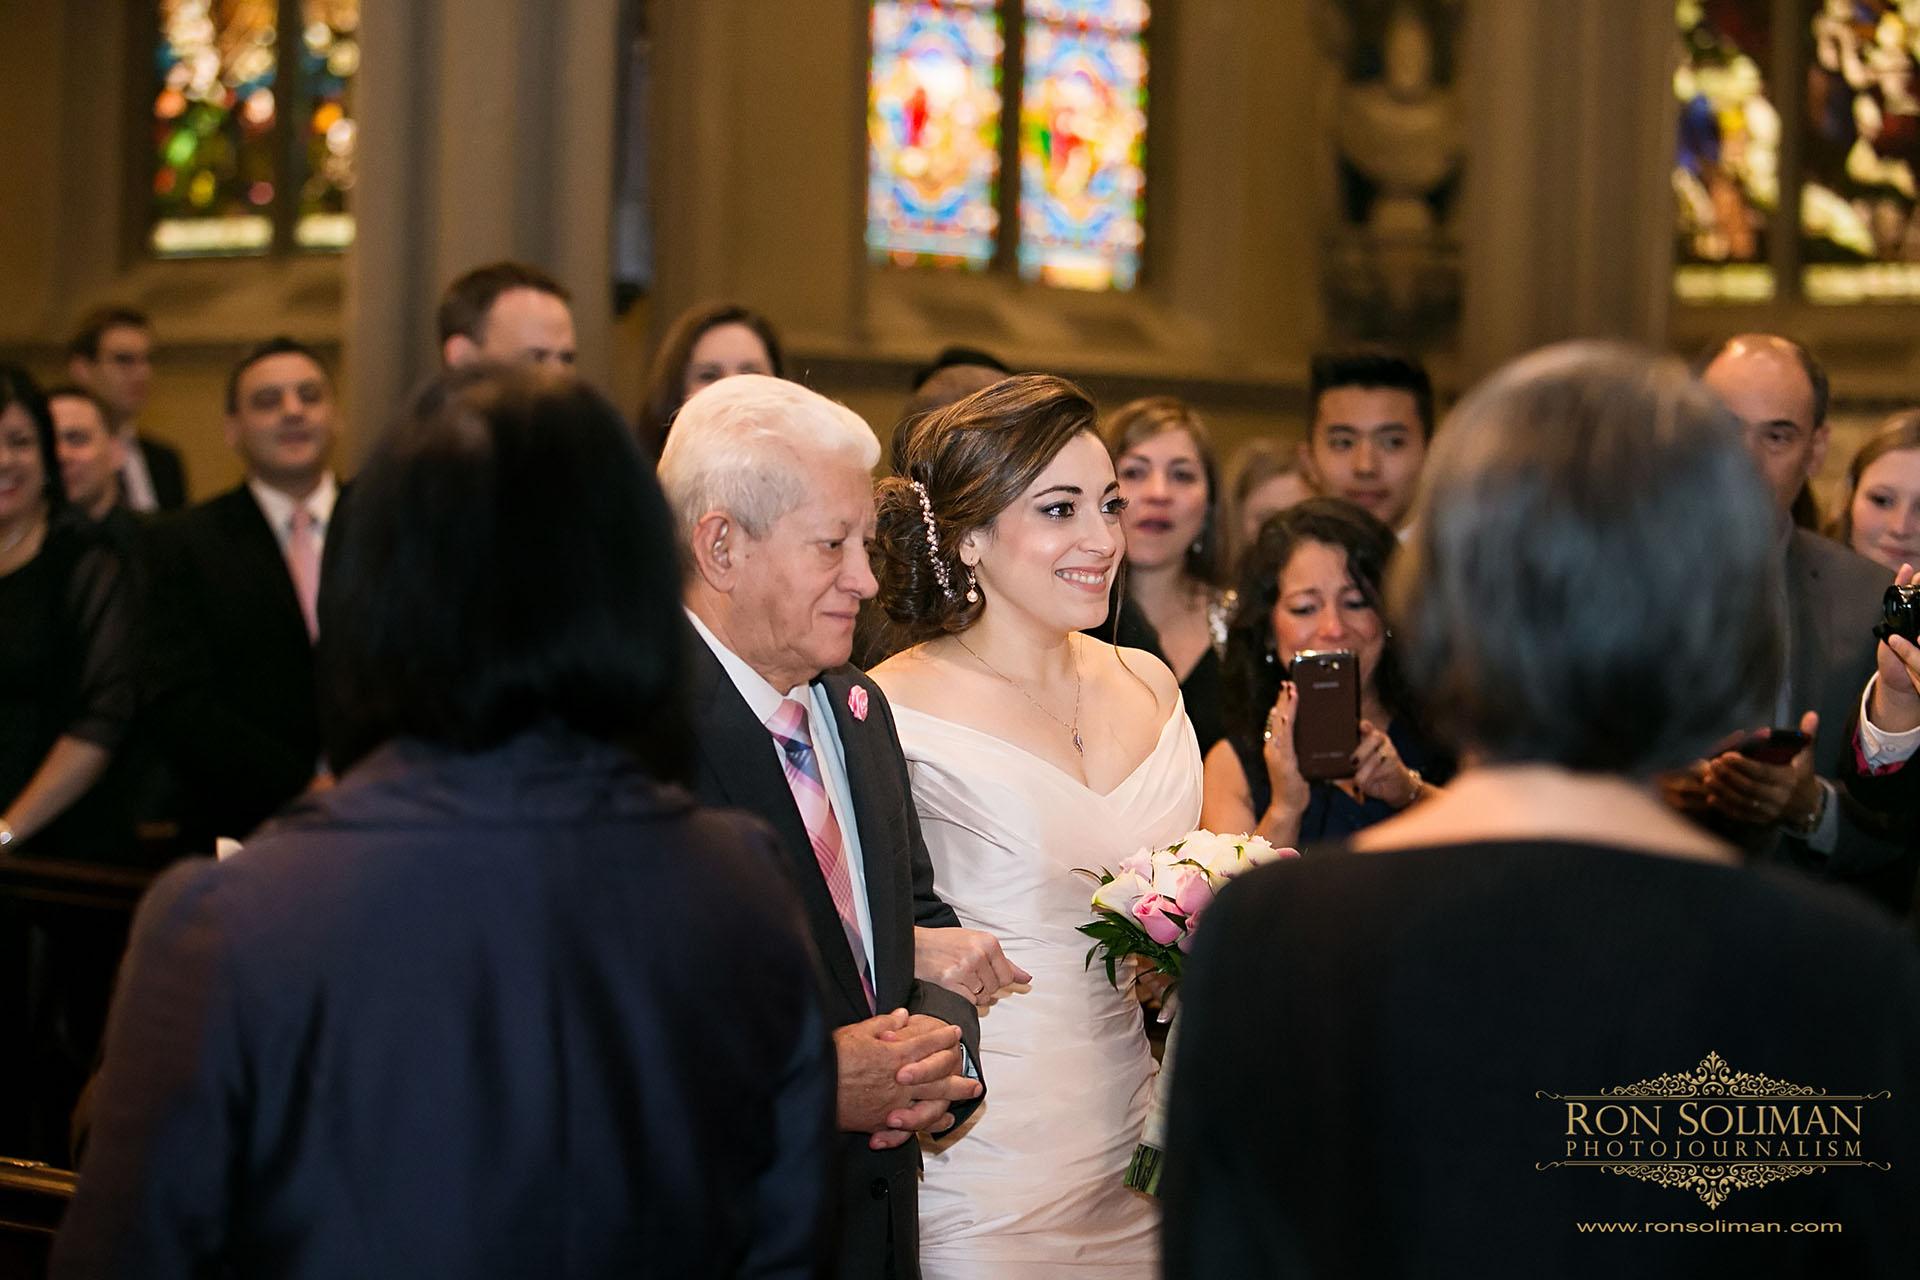 LIGHTHOUSE CHELSEA PIERS WEDDING 10